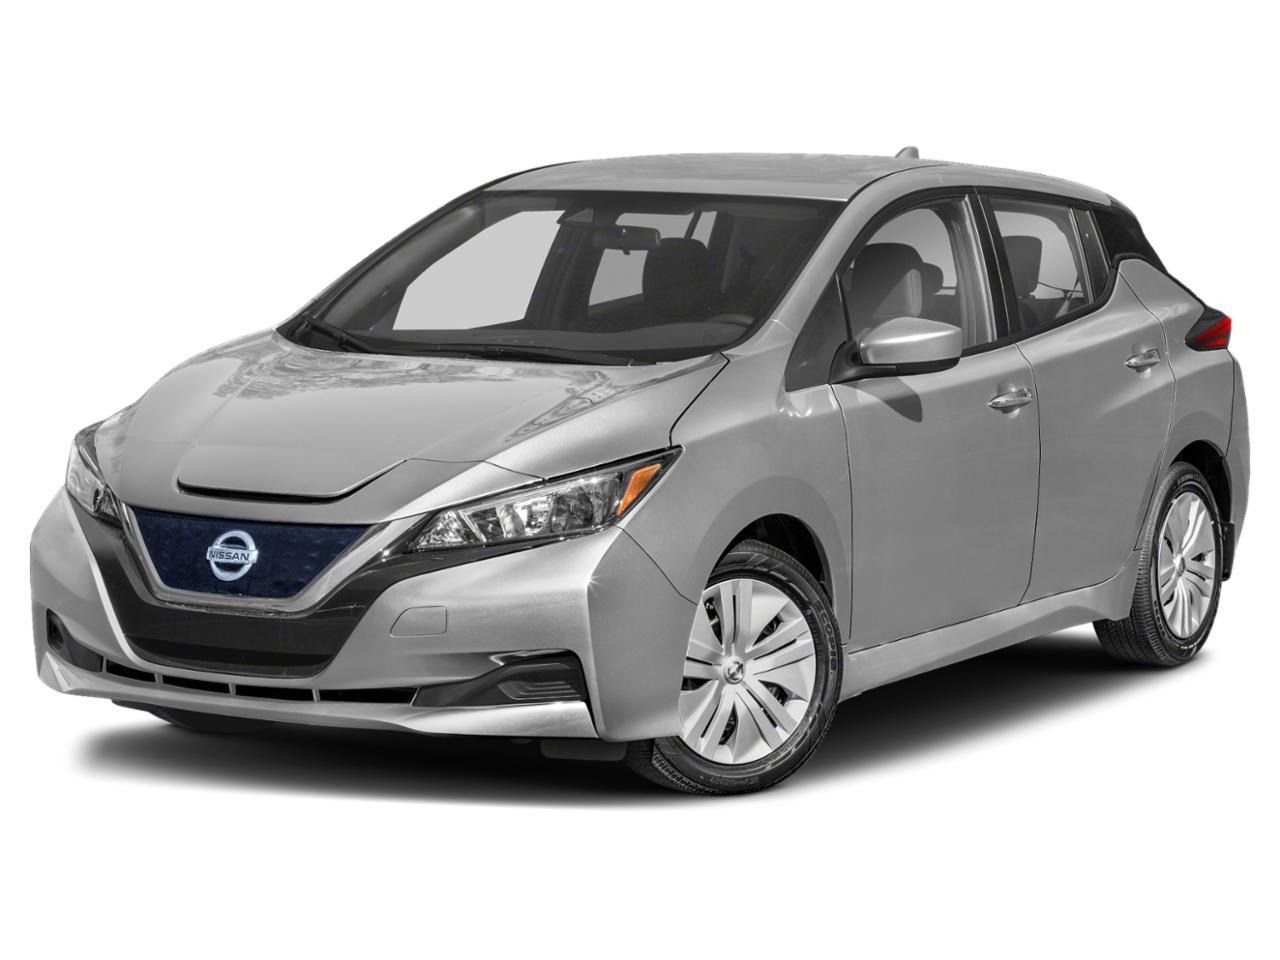 2020 Nissan Leaf For Sale In Davis 1n4bz1cp1lc302015 Hanlees Davis Nissan